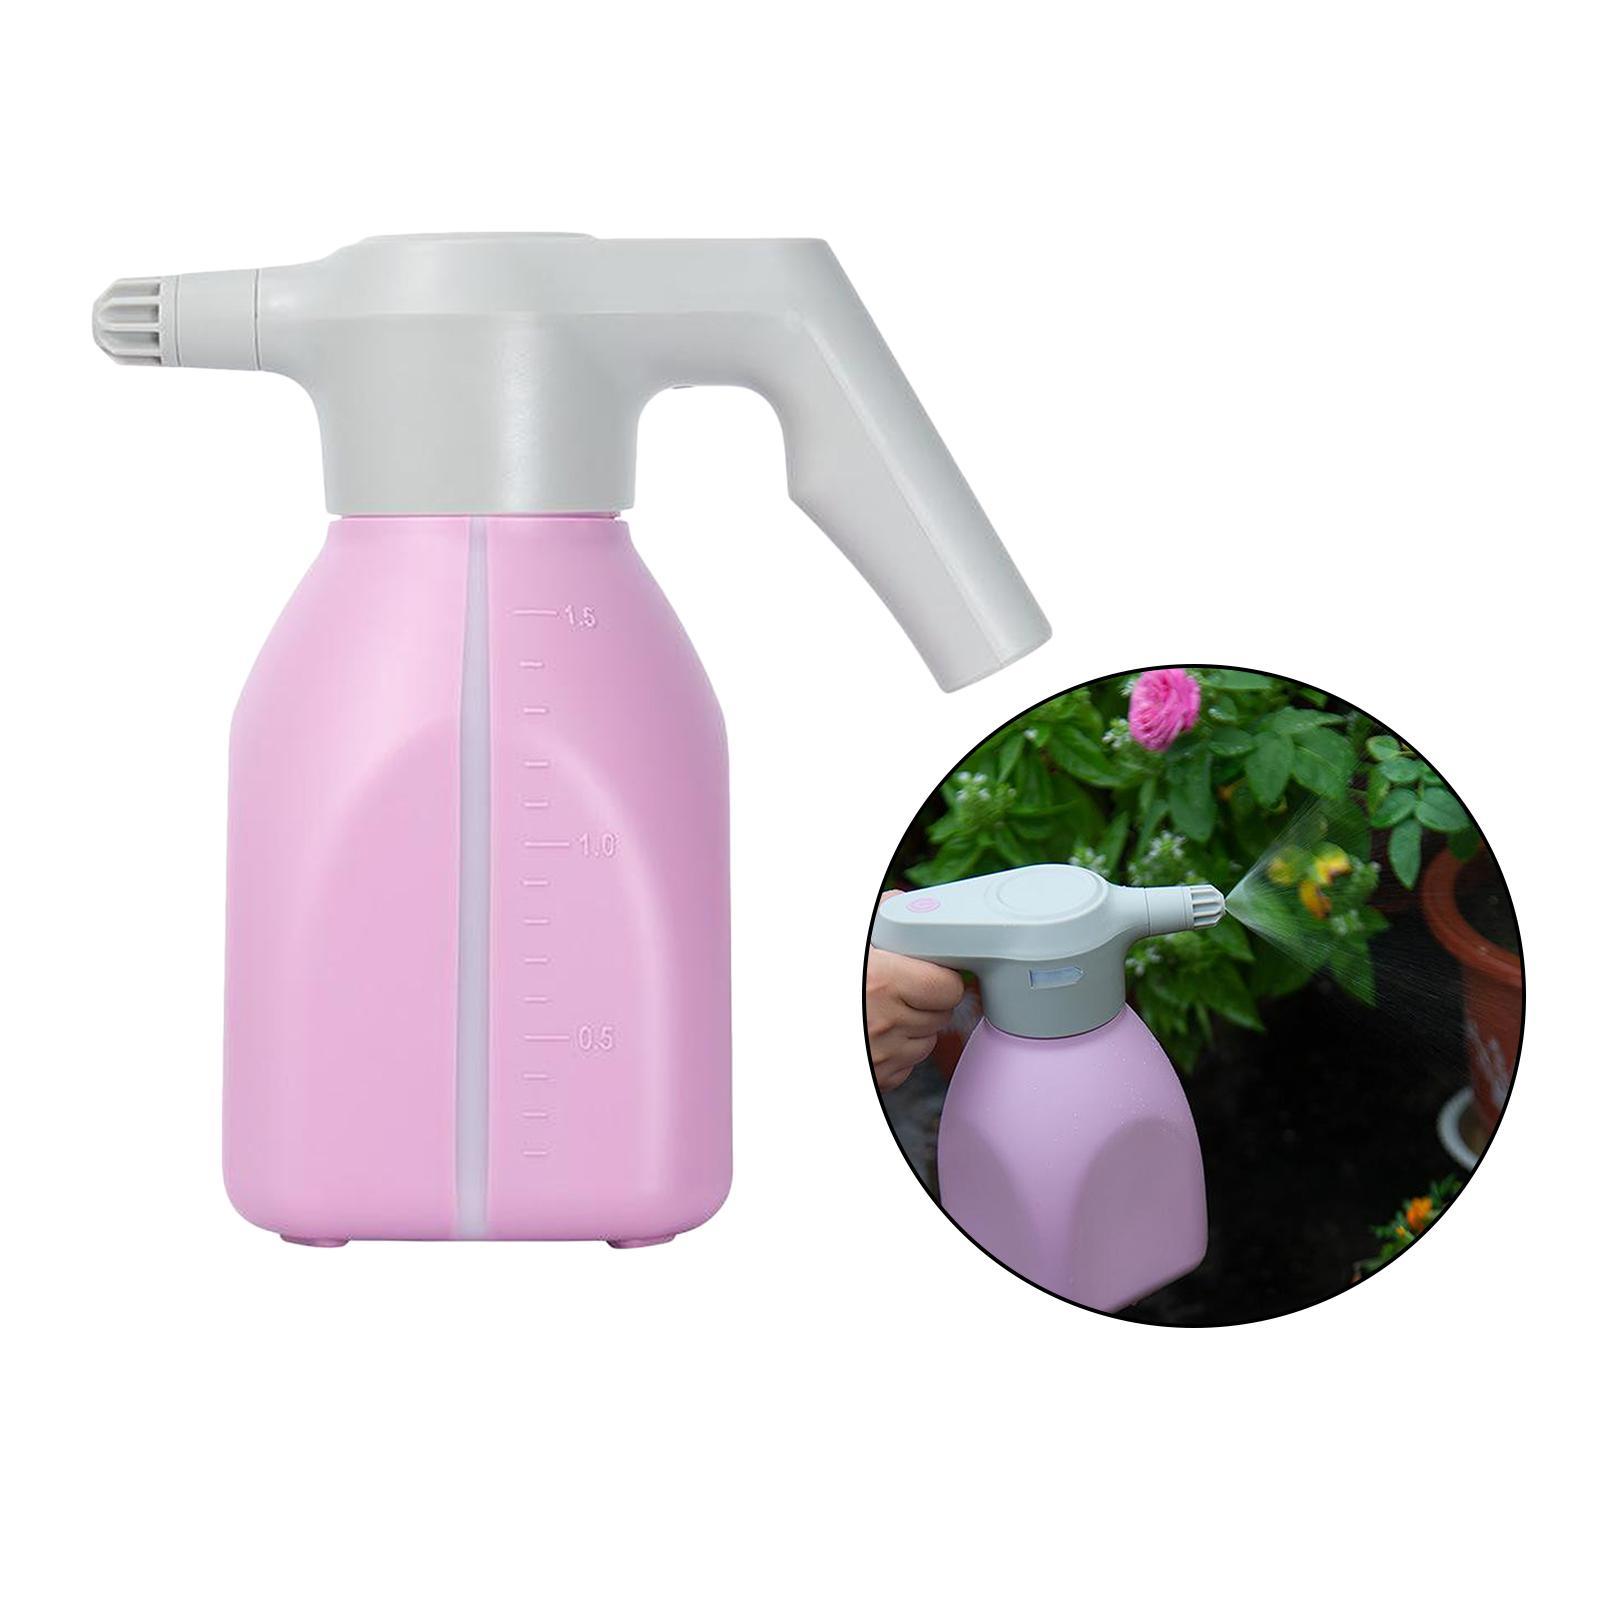 1.5L Electric Plant Sprayer Watering Spray Bottle Auto Fertilizing Sprayer